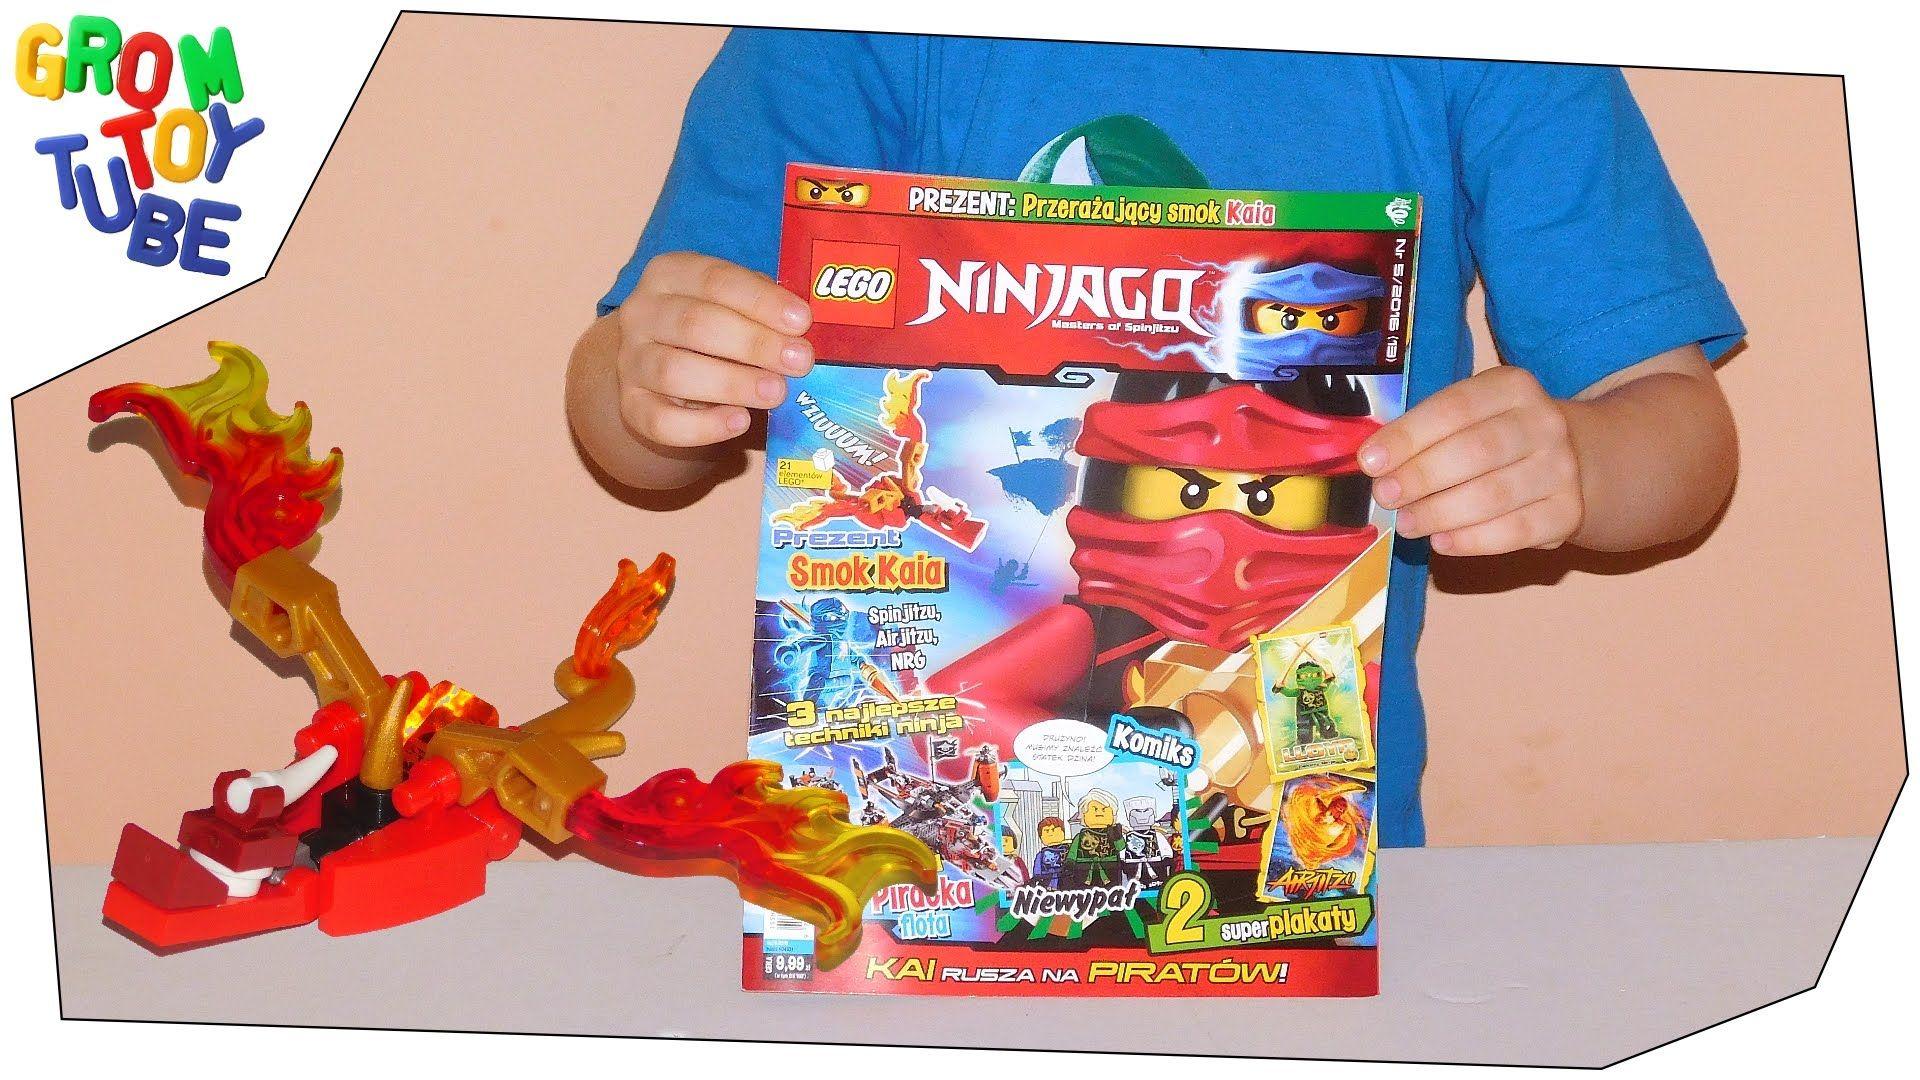 Unboxing New Lego Ninjago Magazine 5 2016 With Kai S Dragon With